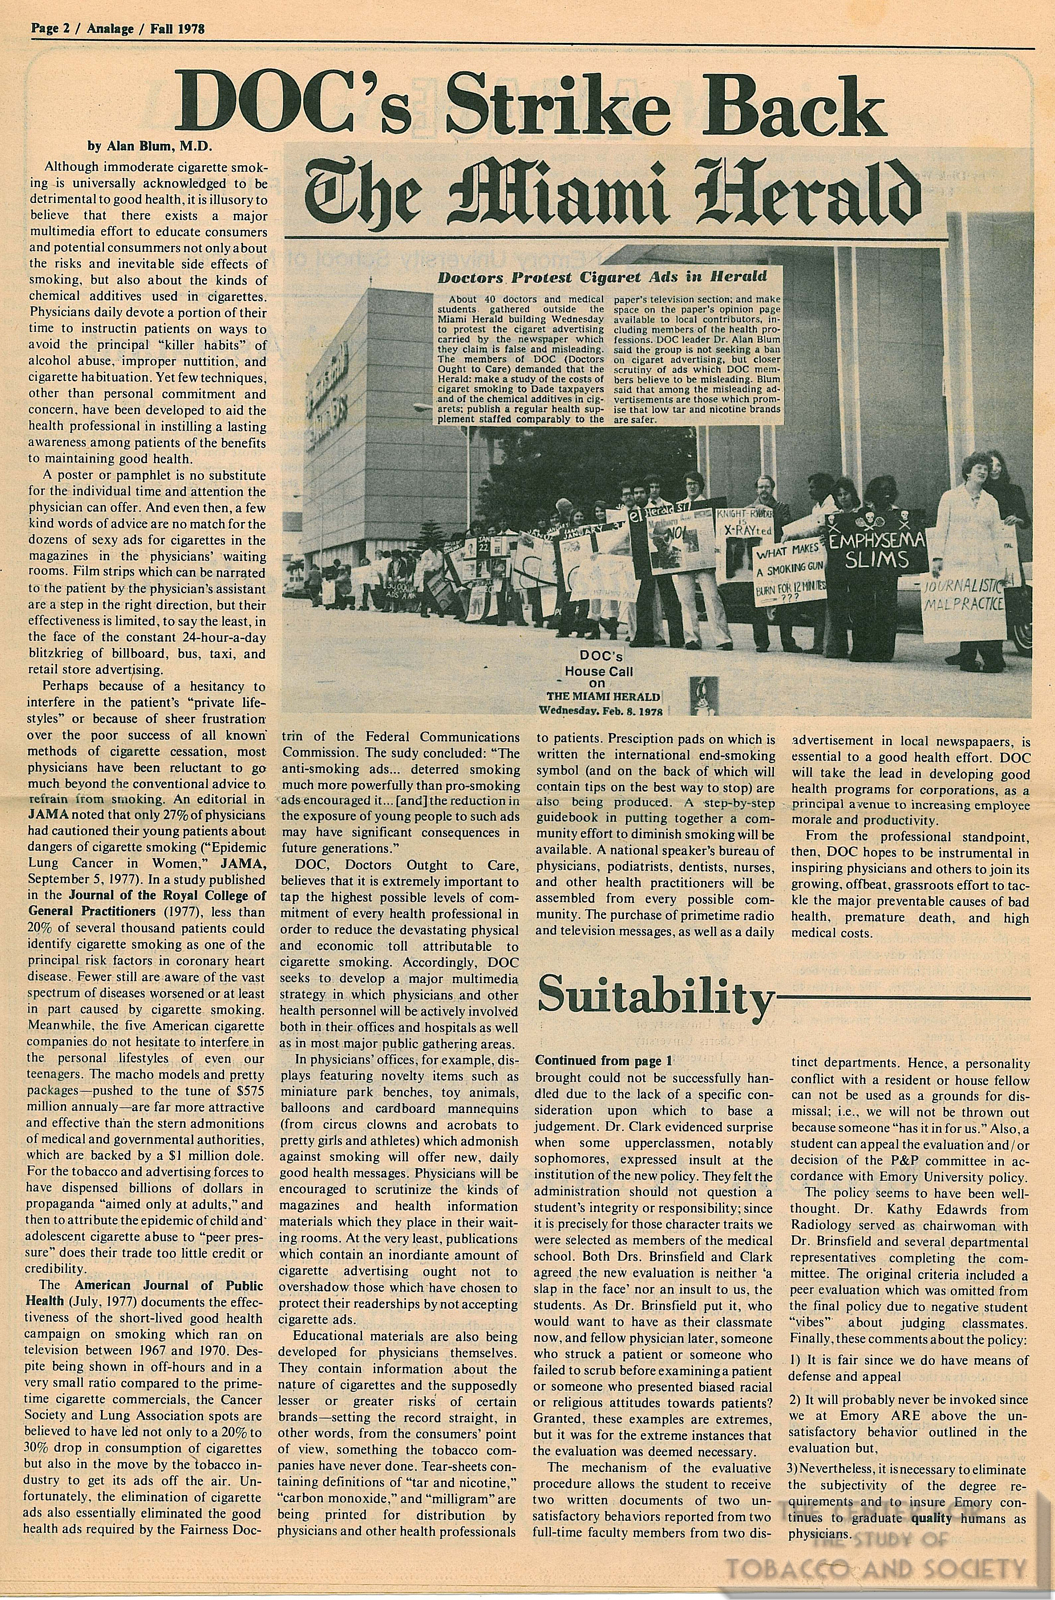 1978 Analage DOCs Strike Back